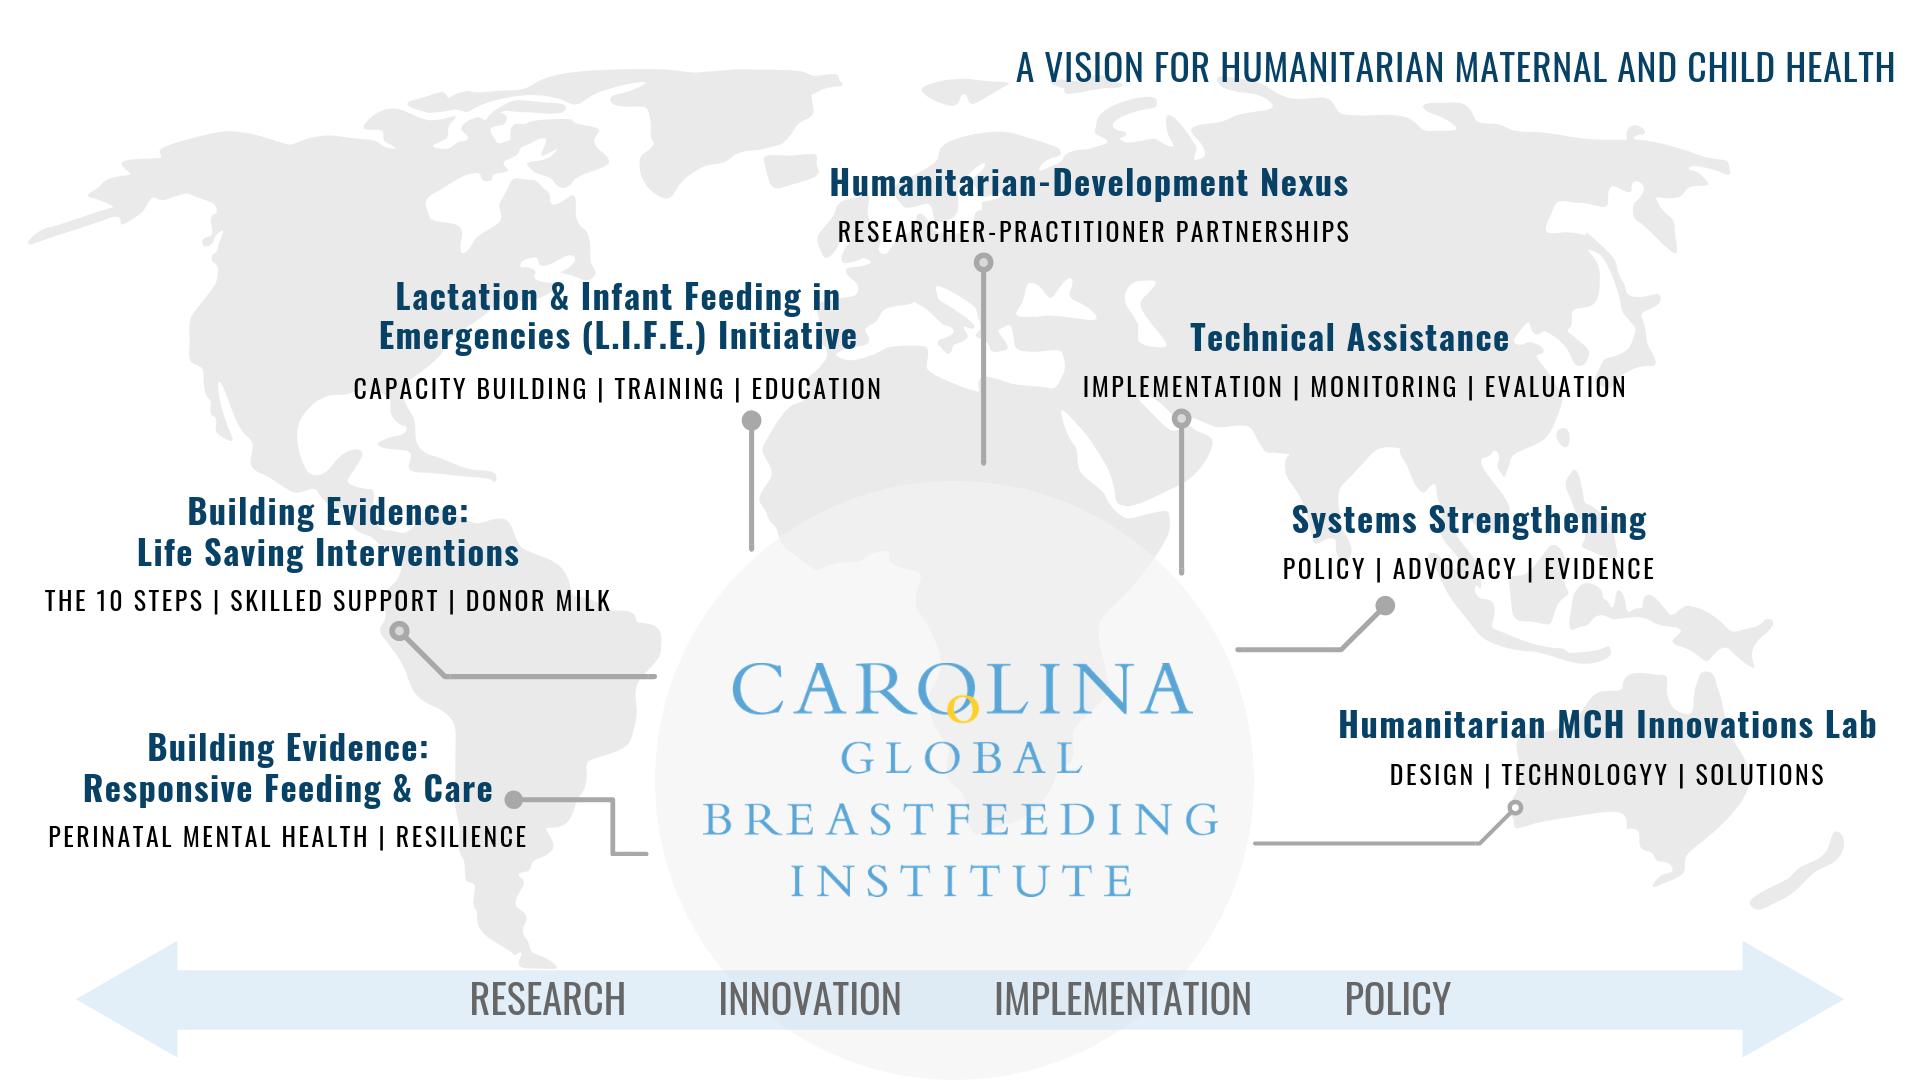 Carolina Global Breastfeeding Institute graphic